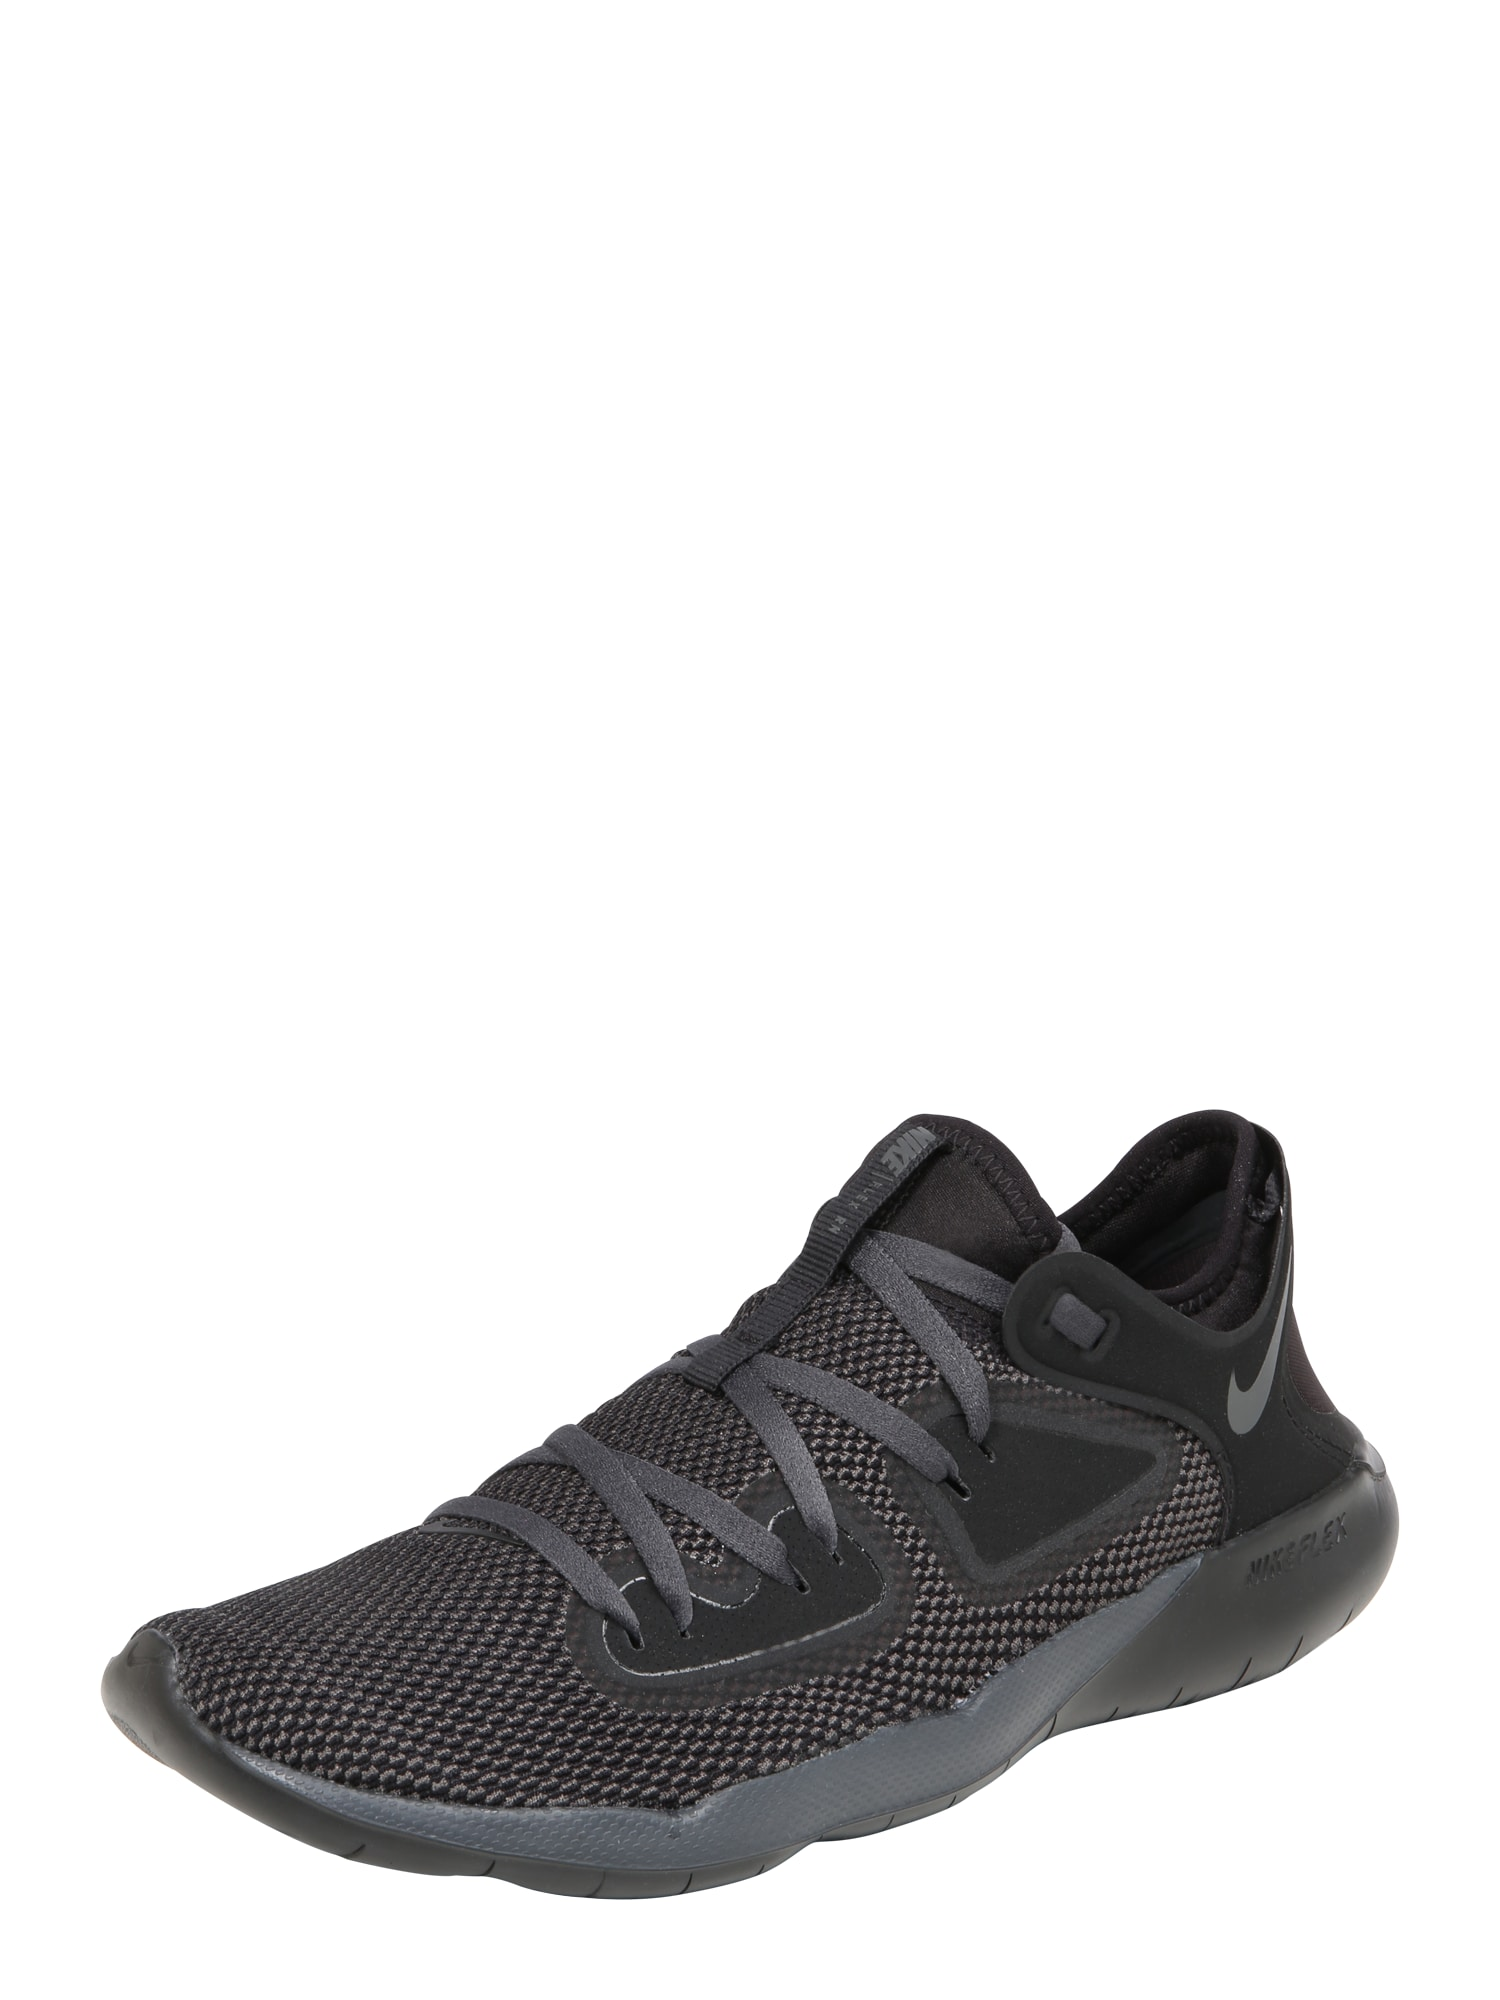 NIKE, Heren Loopschoen 'Nike Flex 2019 RN', zwart